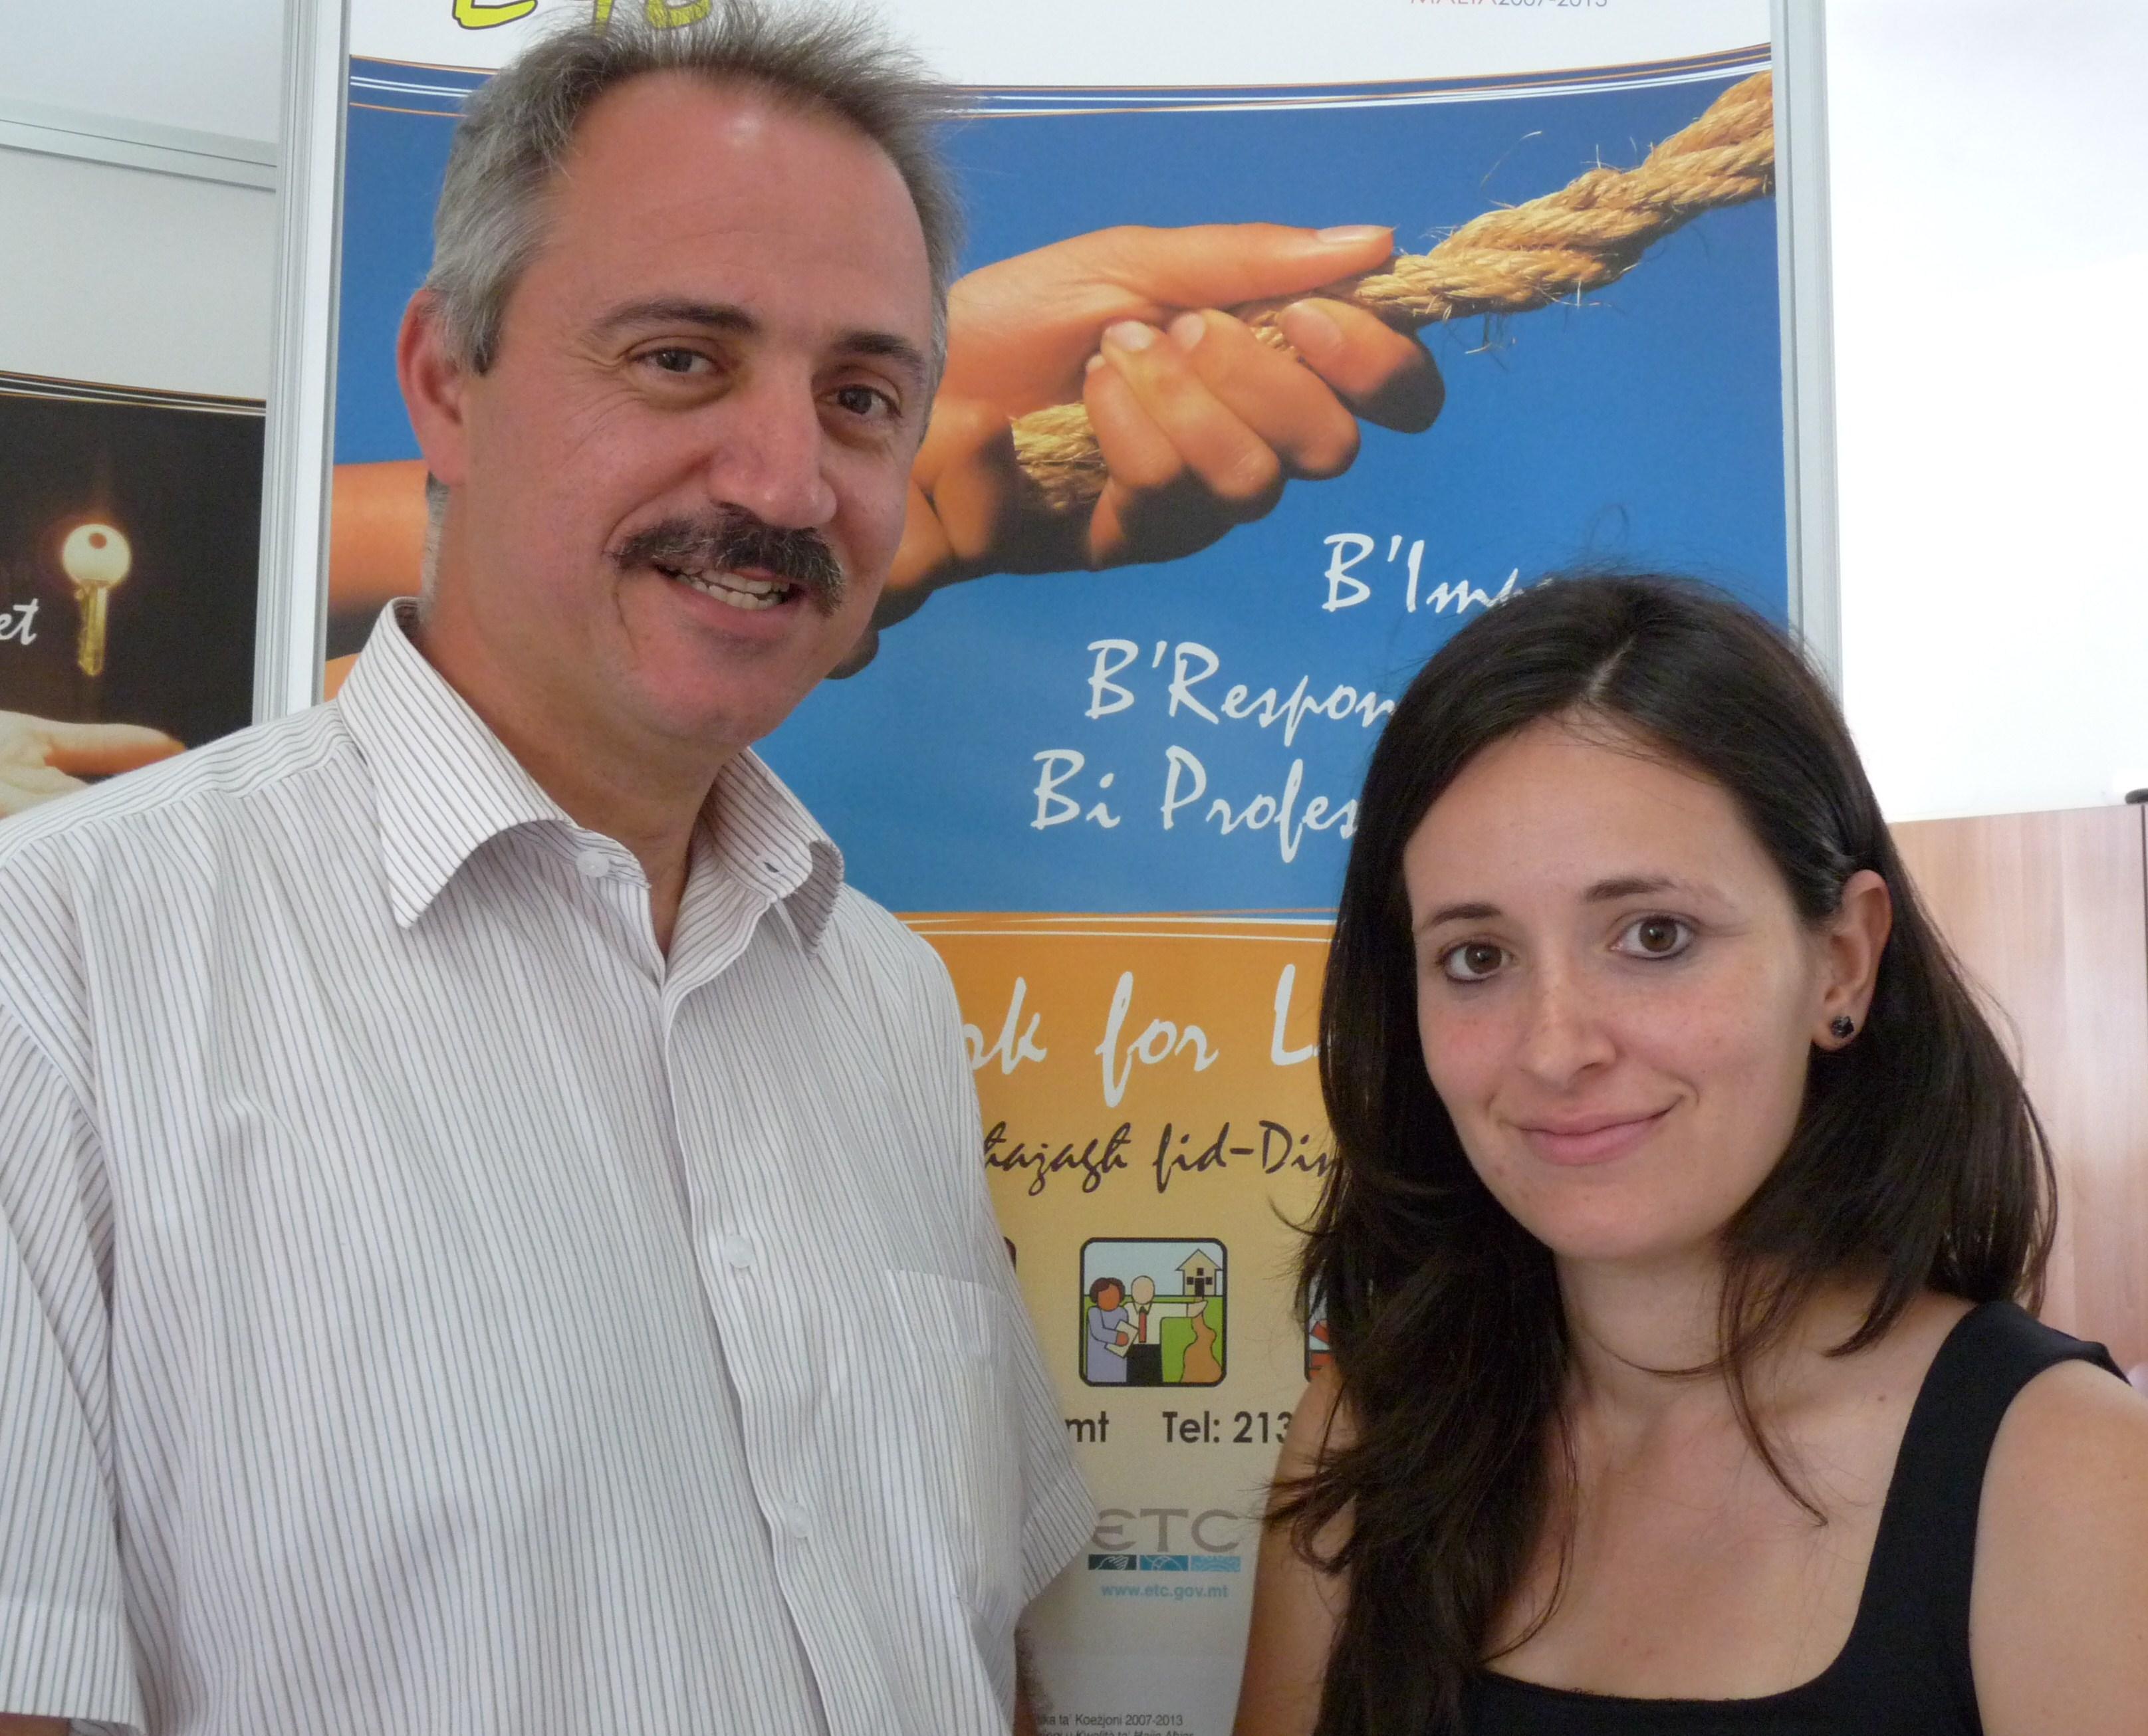 jessica camilleri - photo #11